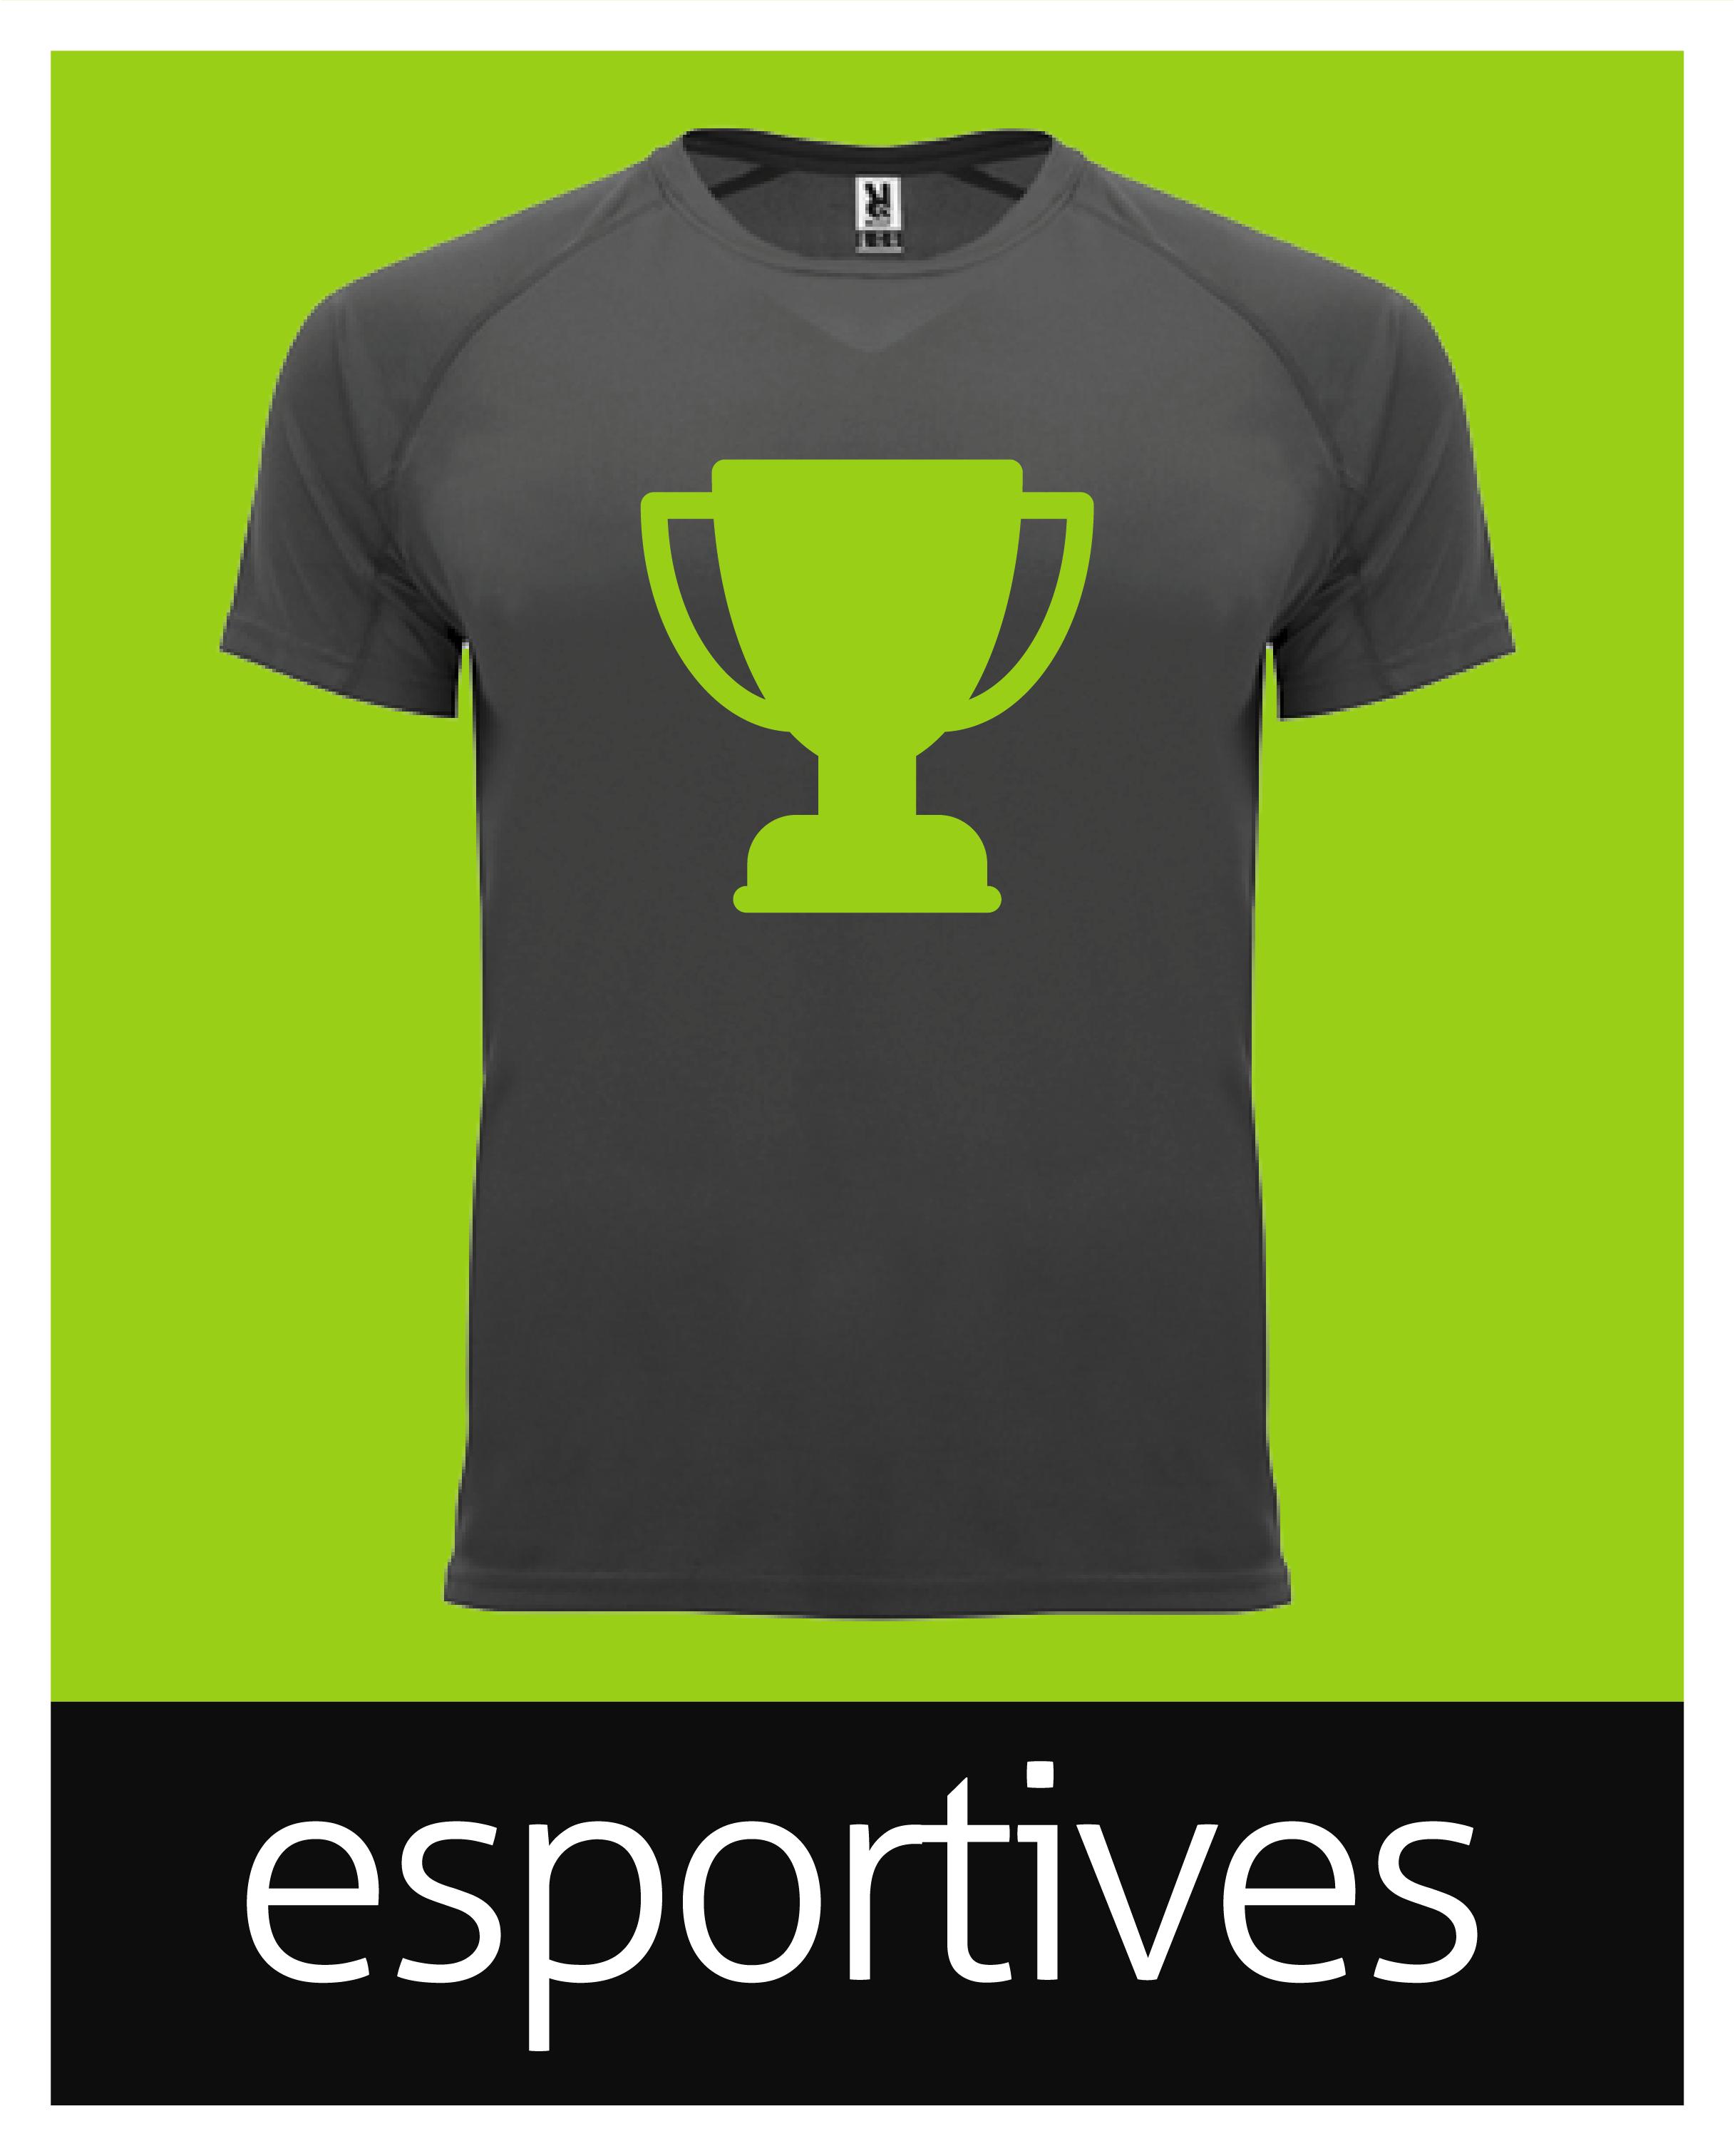 esportives.png